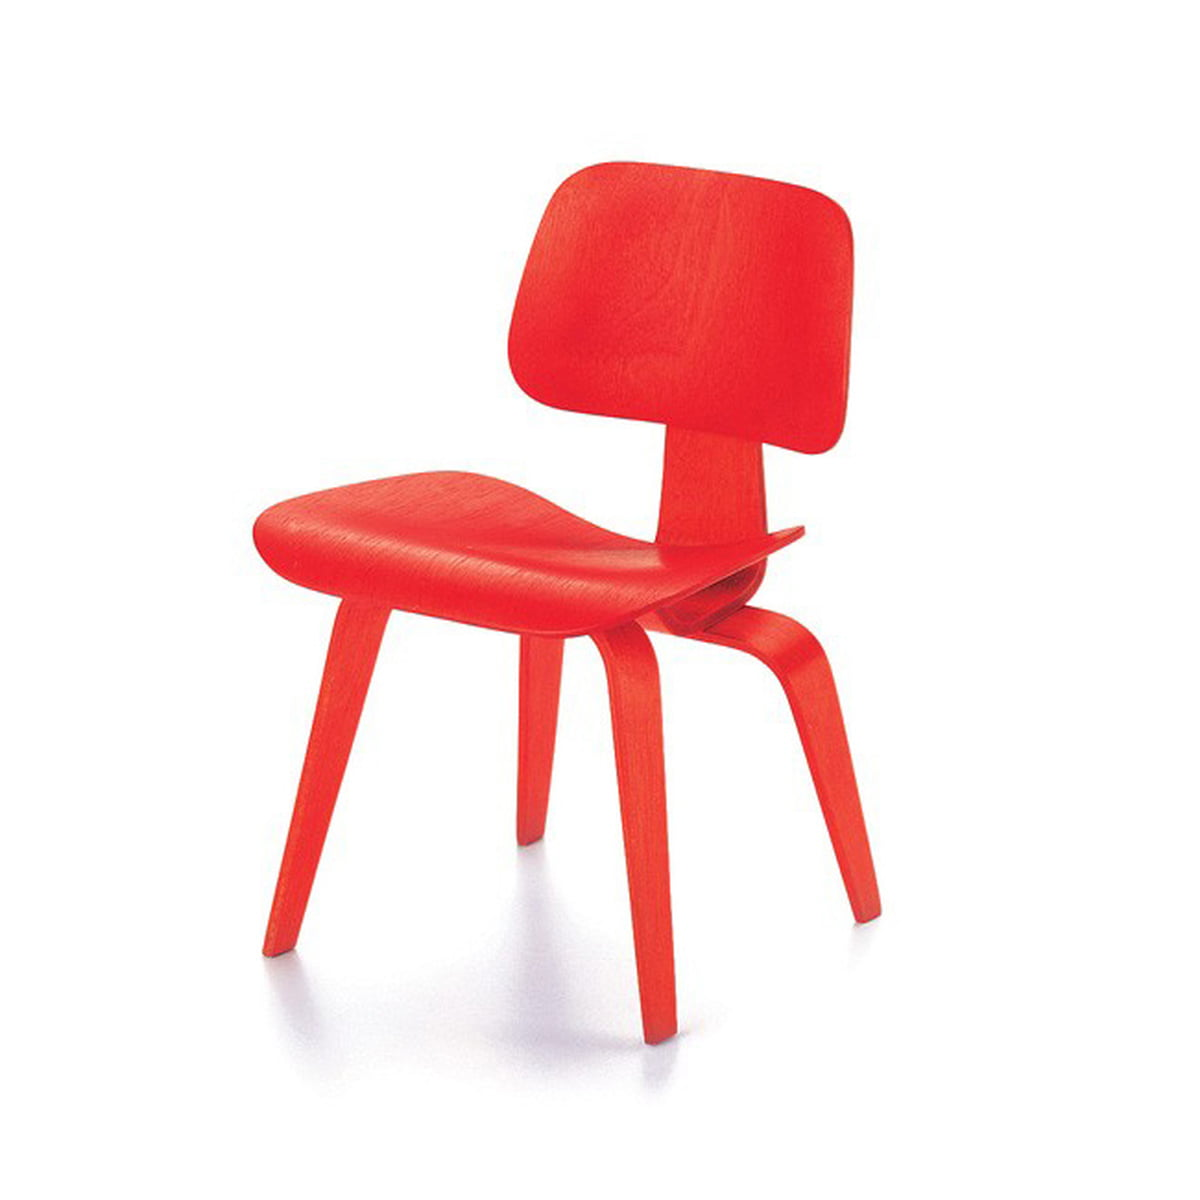 miniatur eames dcw stuhl vitra shop. Black Bedroom Furniture Sets. Home Design Ideas